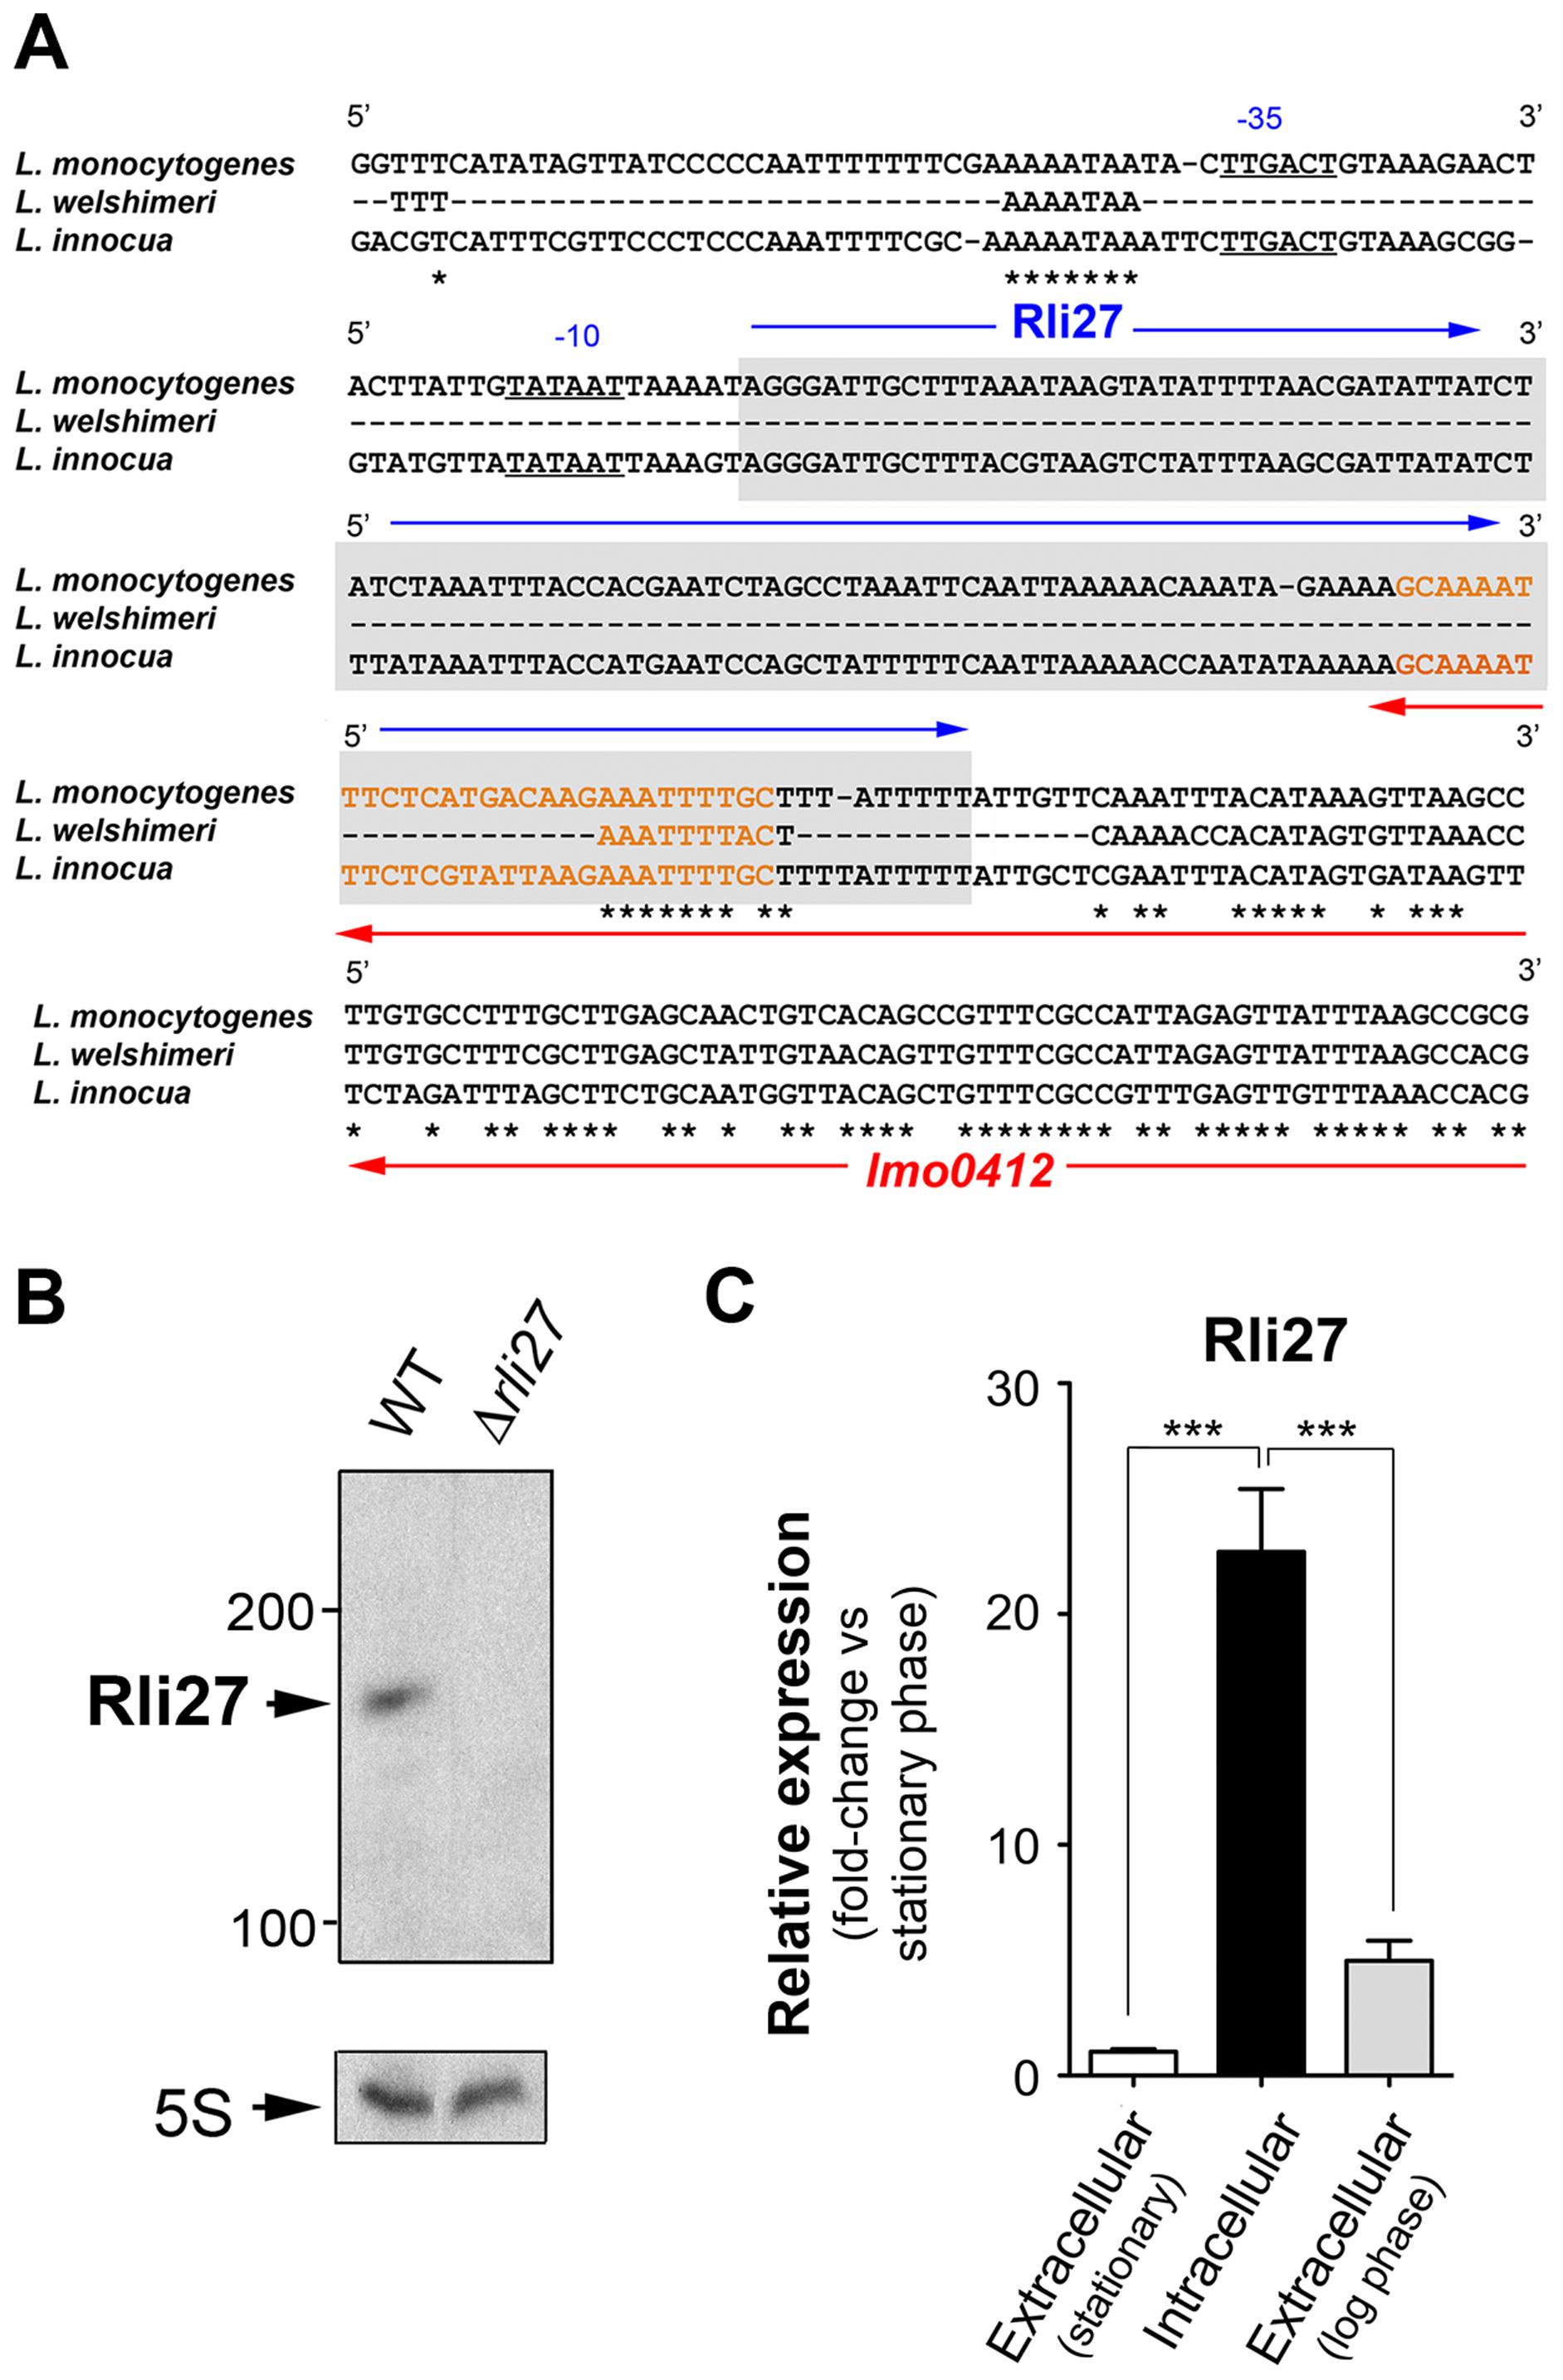 Rli27 is a bona fide <i>L. monocytogenes</i> sRNA induced by intracellular bacteria.